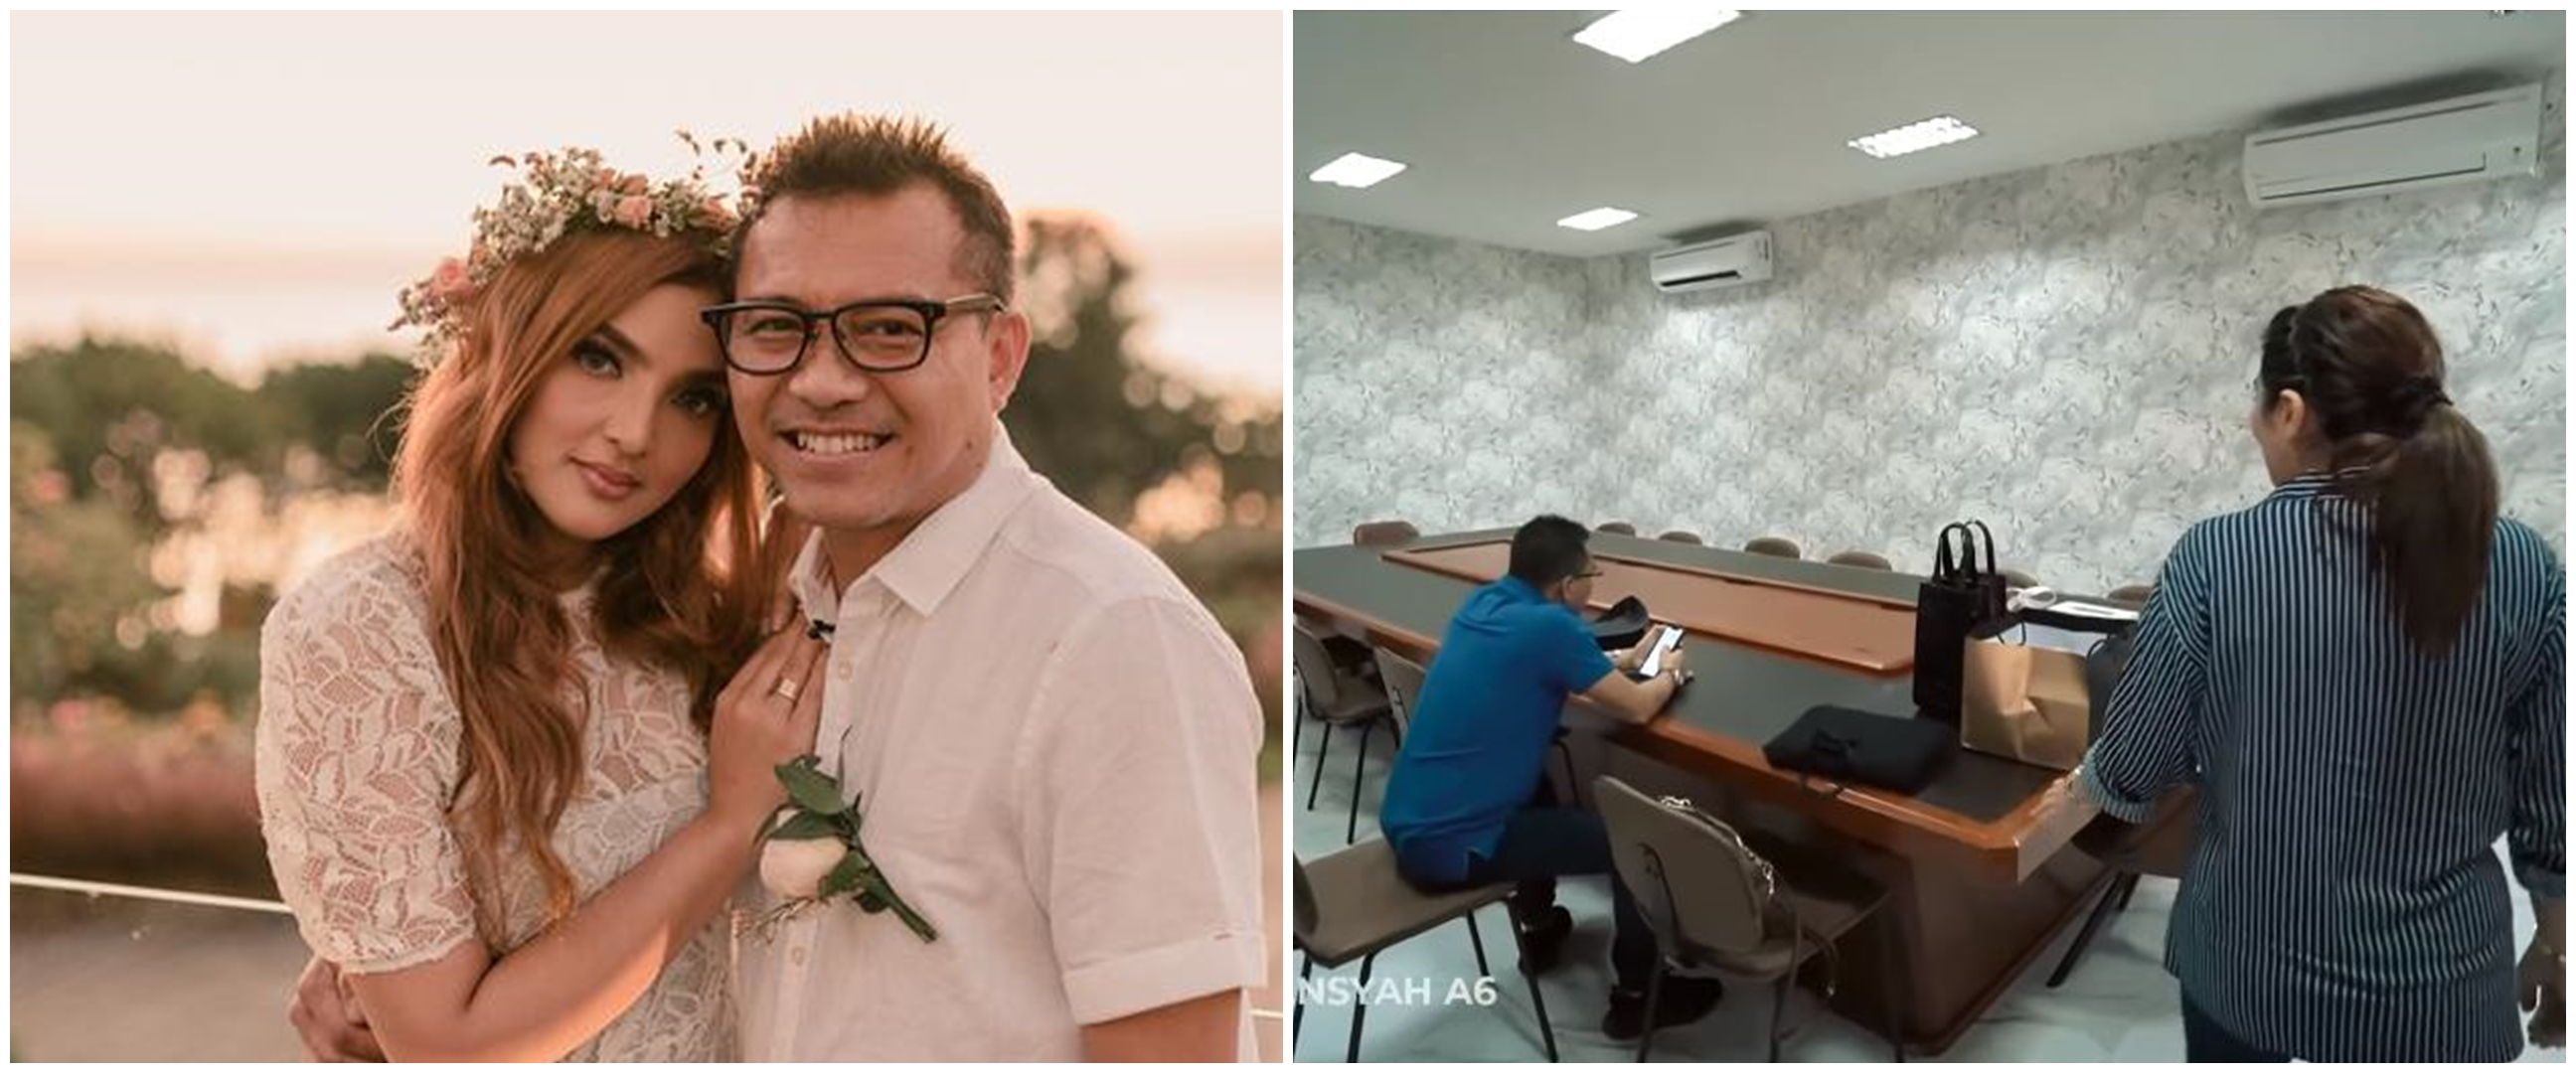 10 Potret kantor baru milik Ashanty & Anang, luas & bertingkat 5